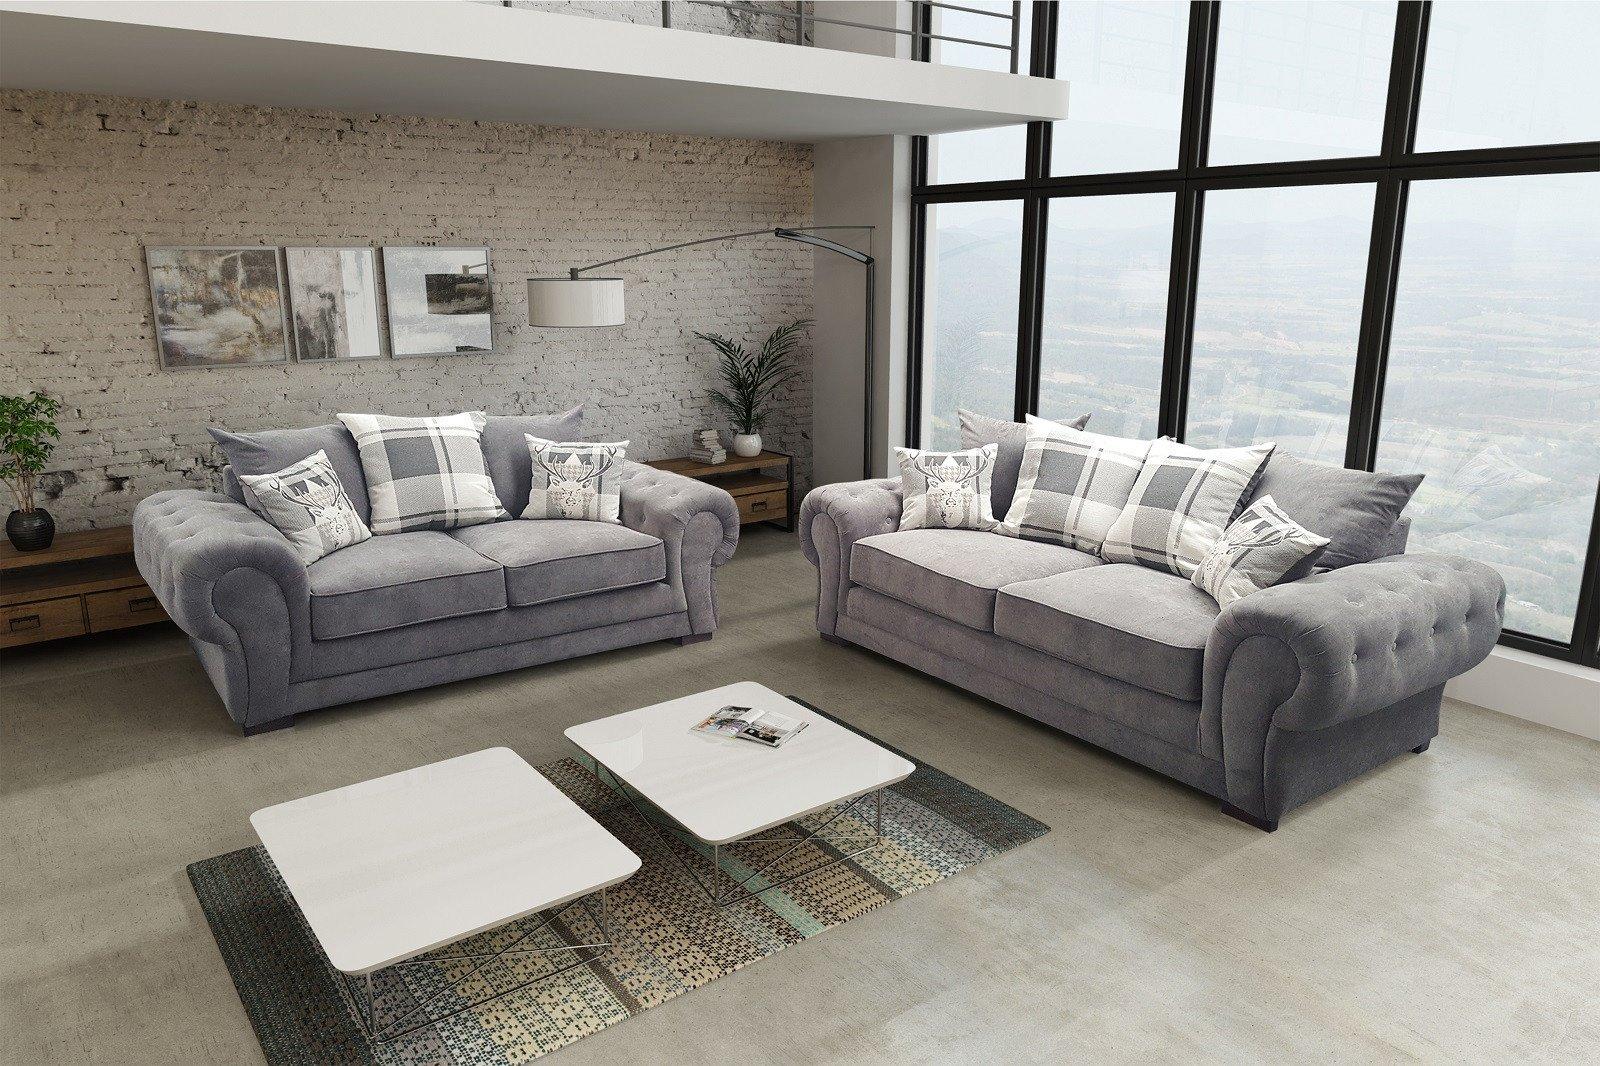 Sofa suites verona sofa suite NDKETCW